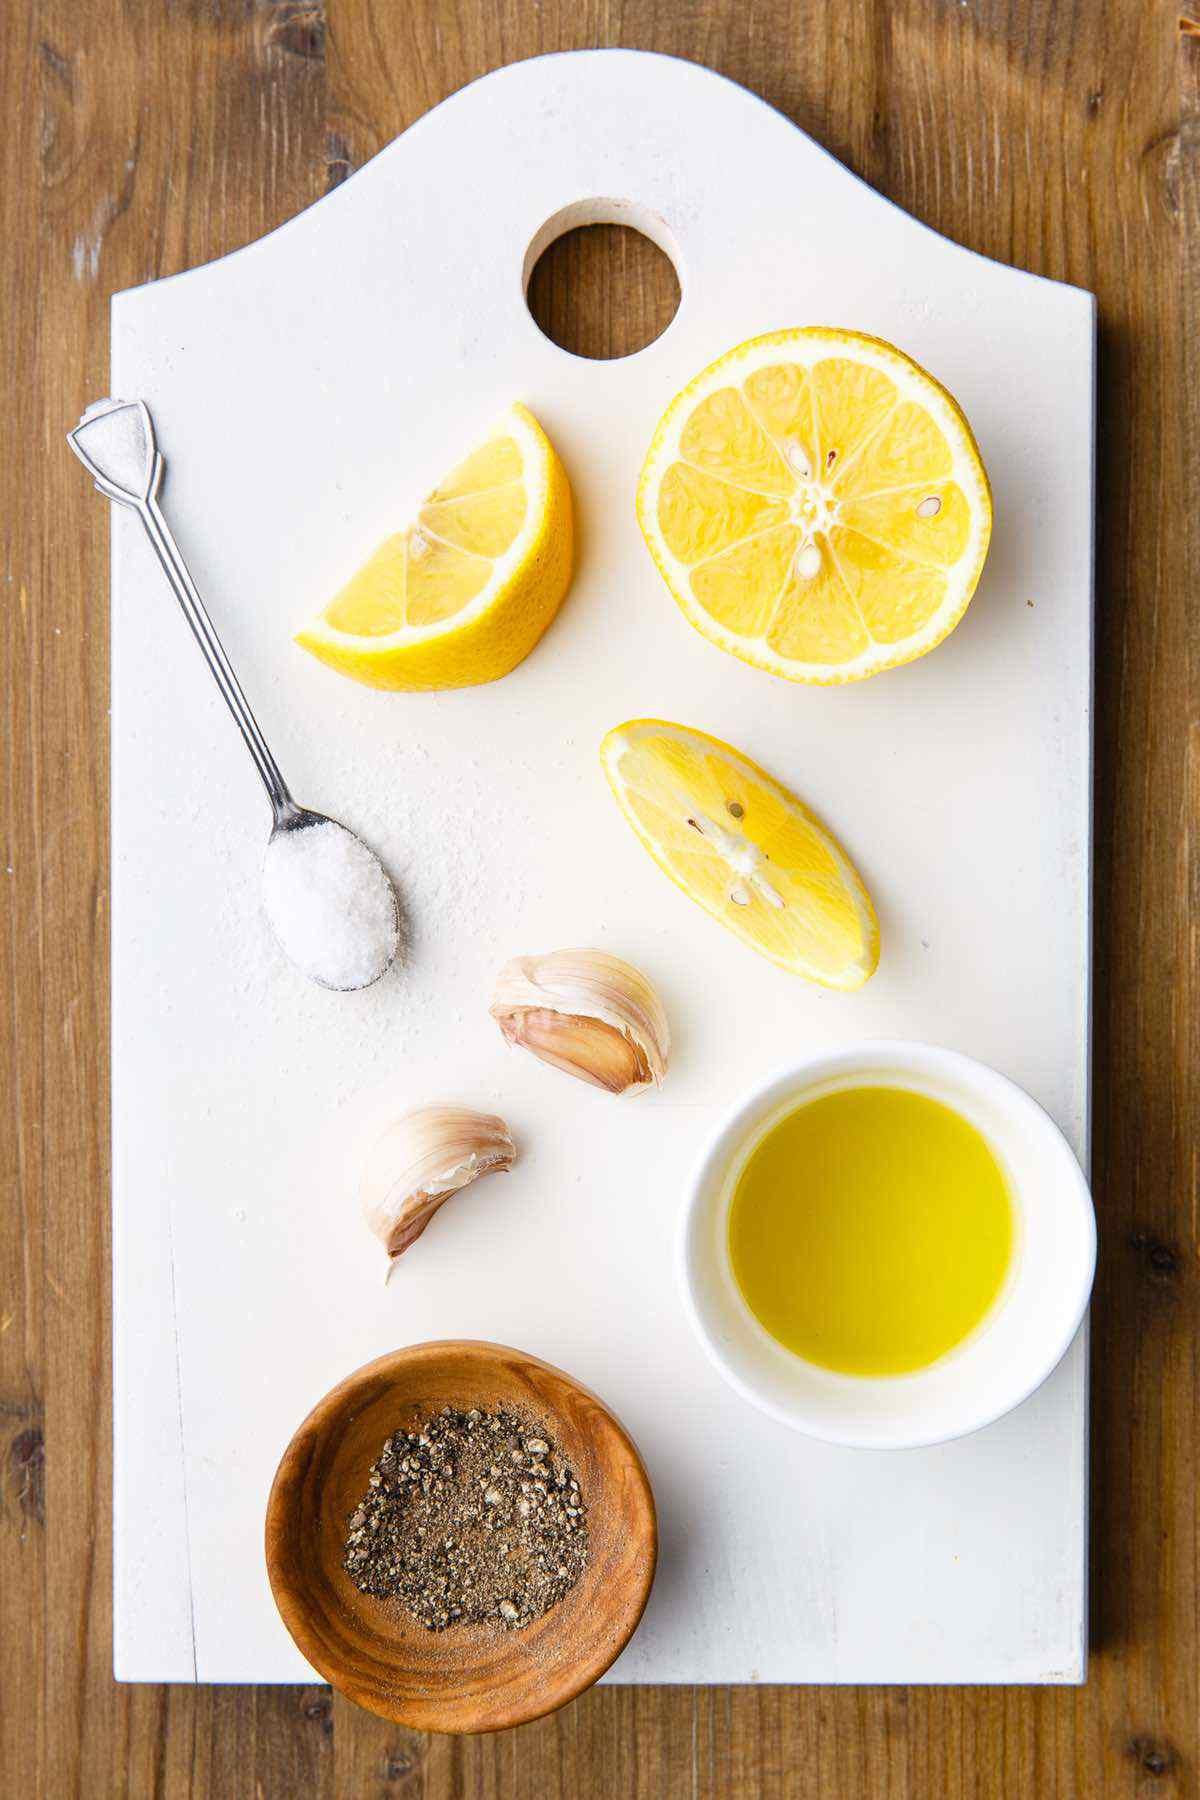 prepping lemon and garlic